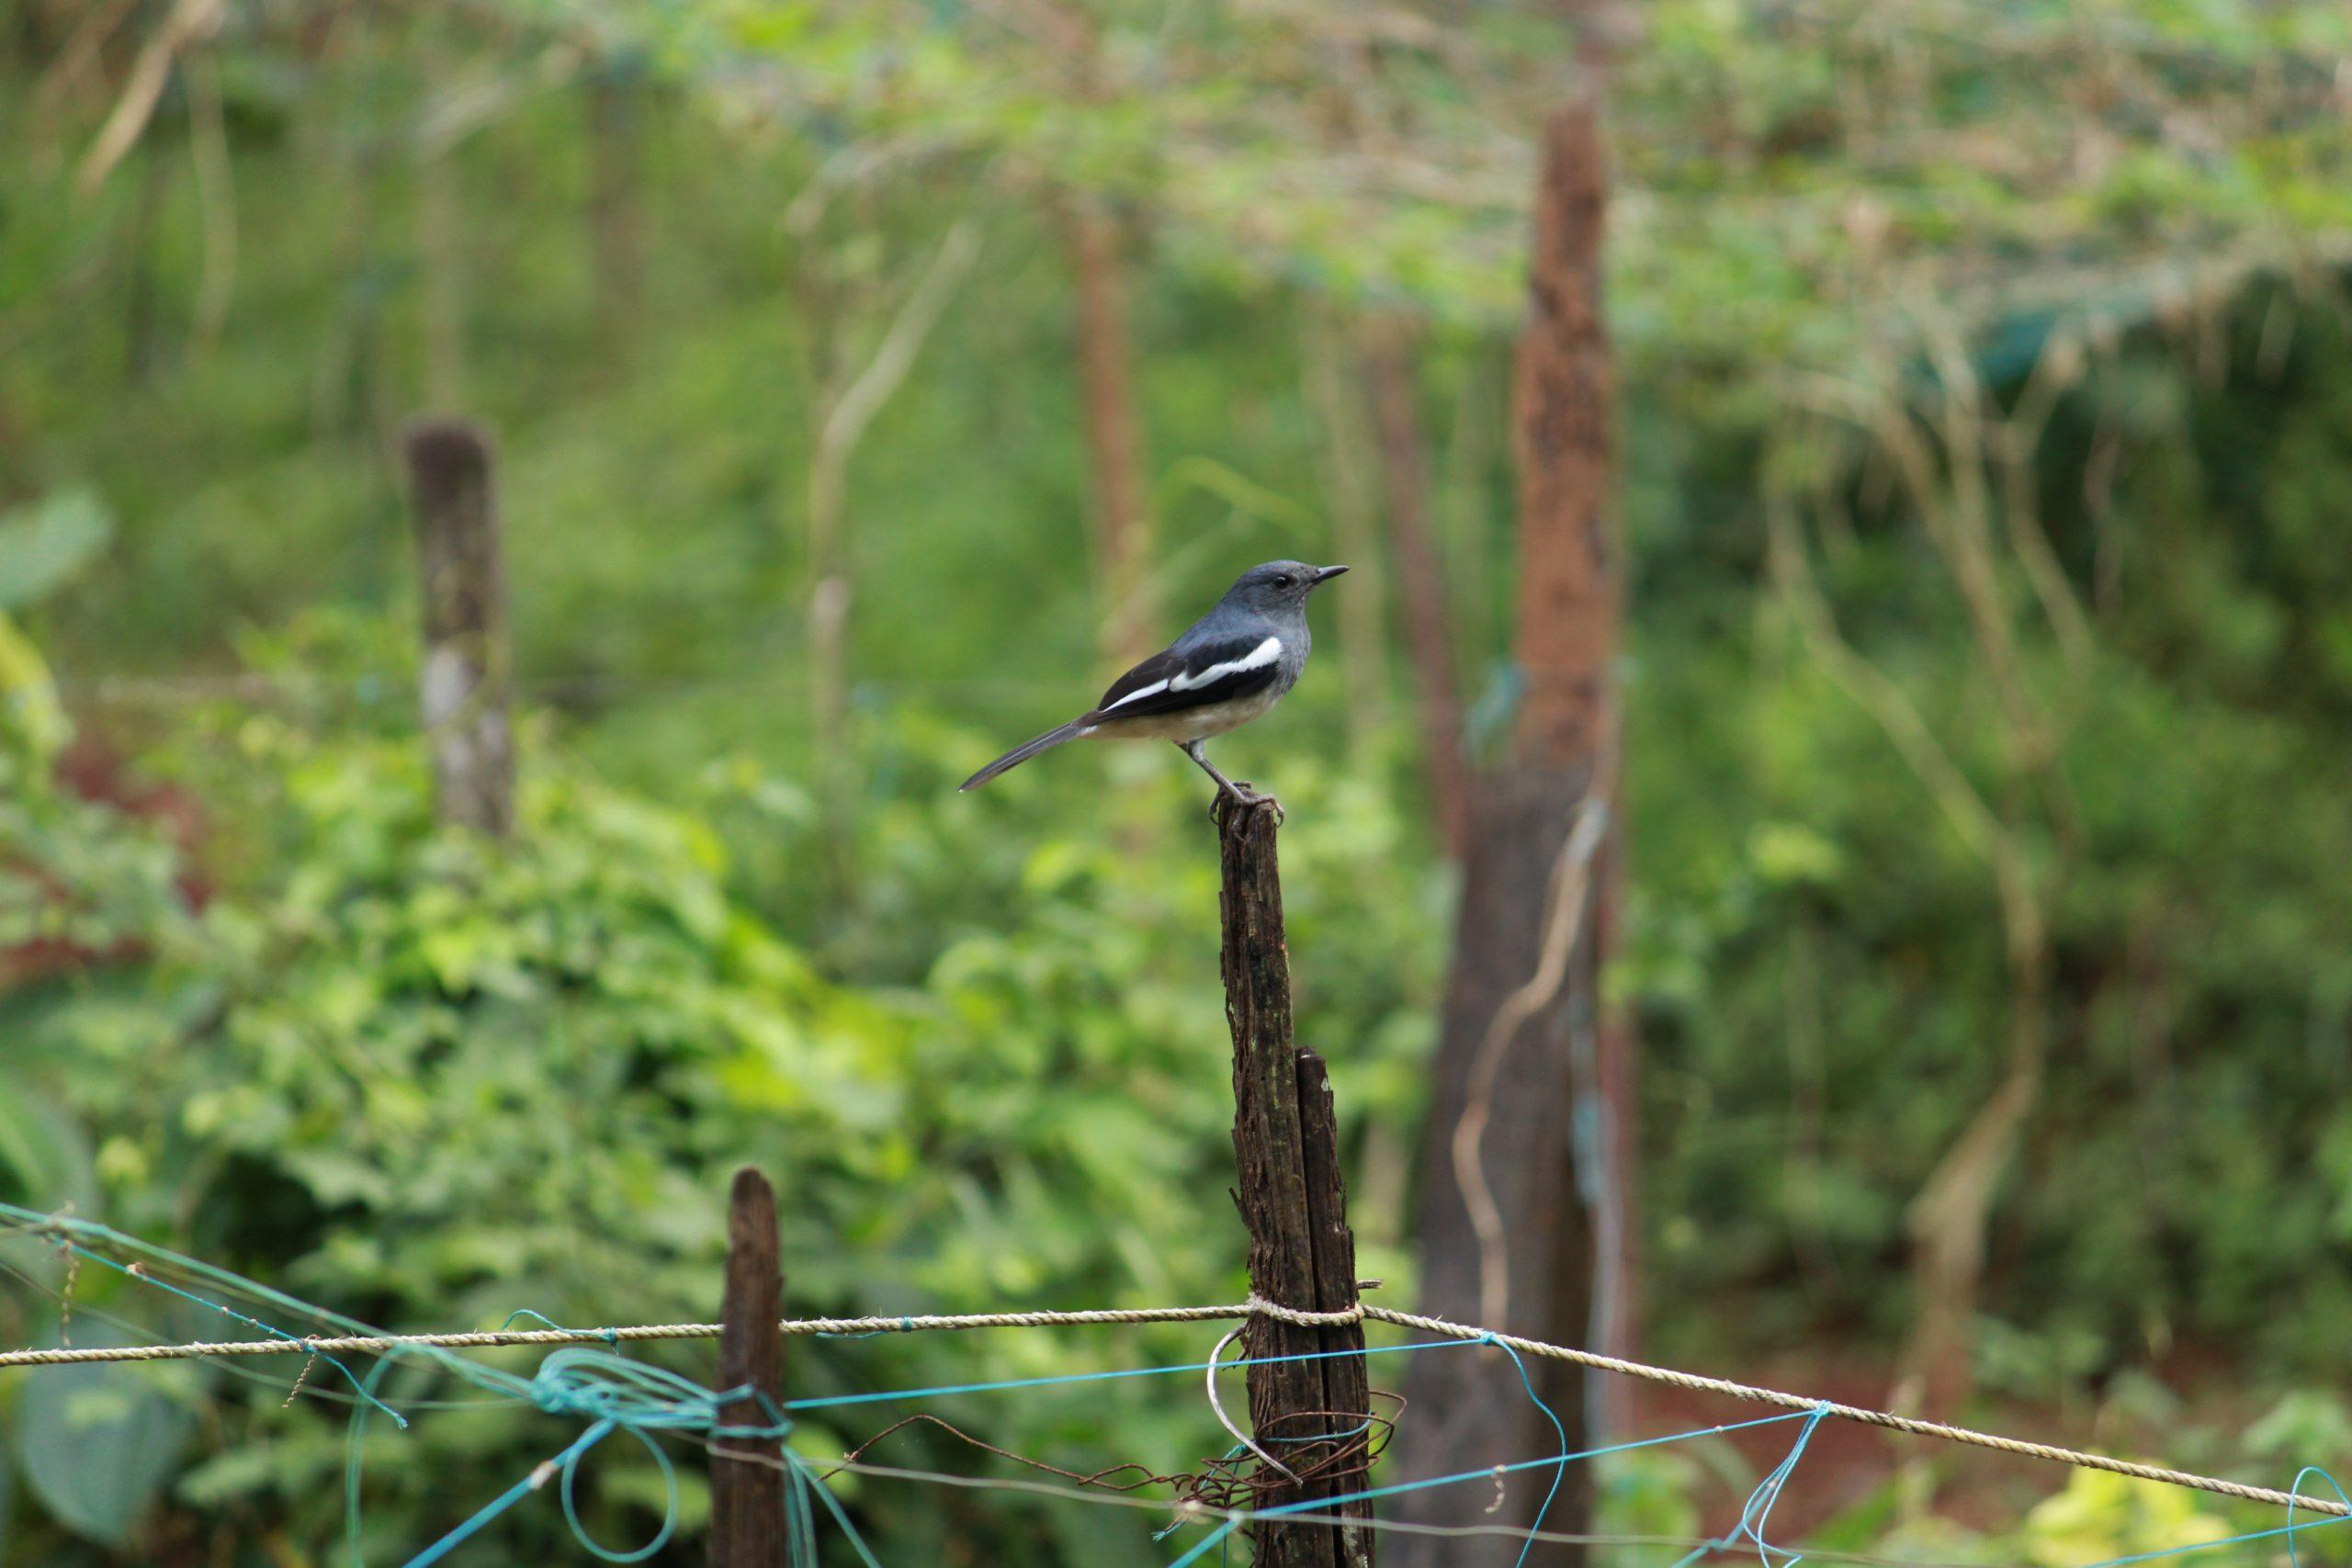 Bird sitting on wood